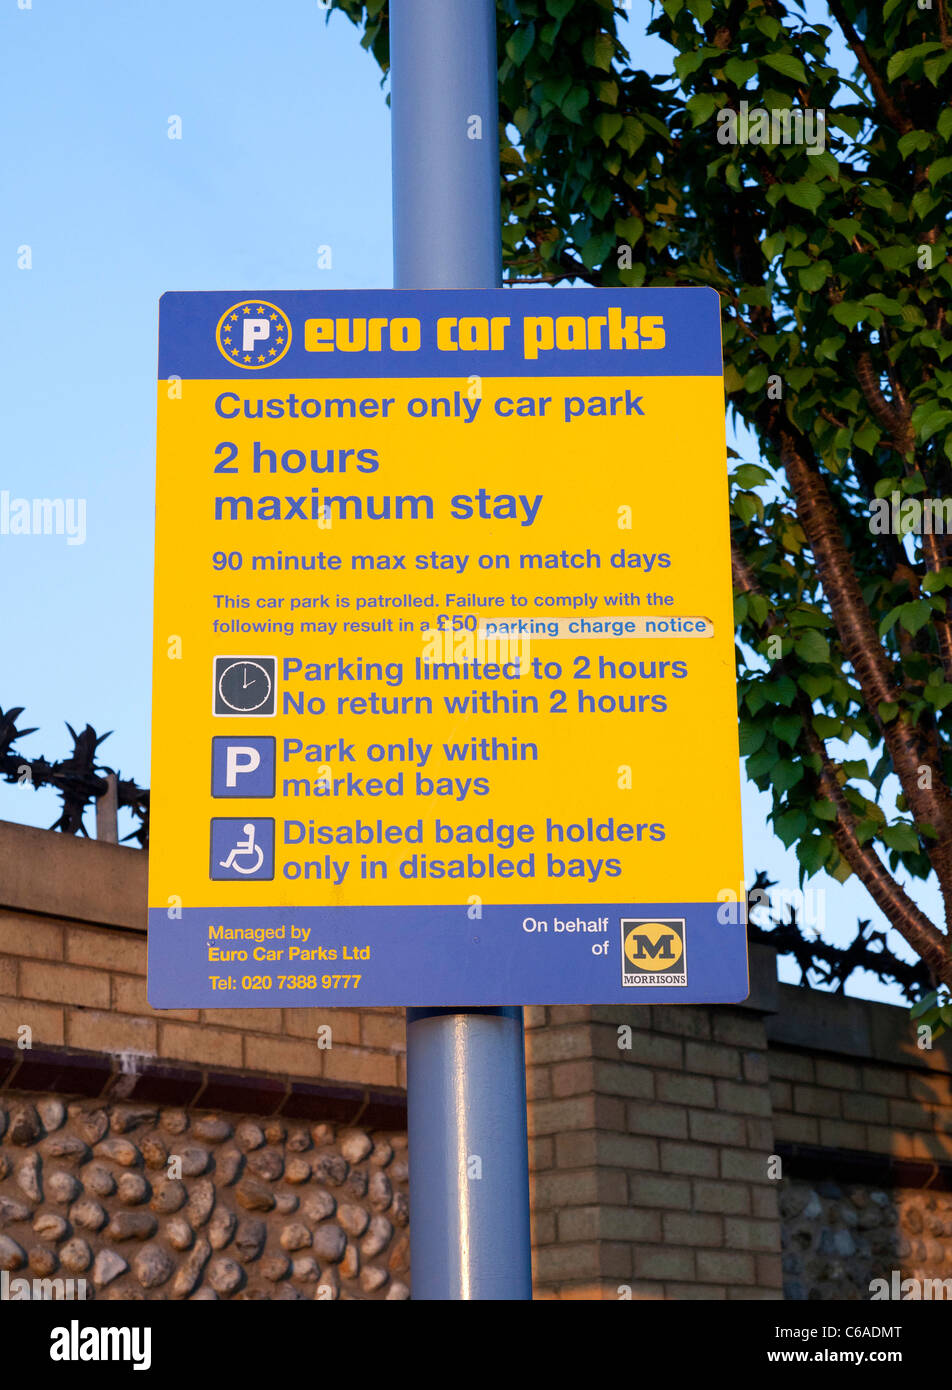 Euro Car Parks Stock Photos Euro Car Parks Stock Images Alamy